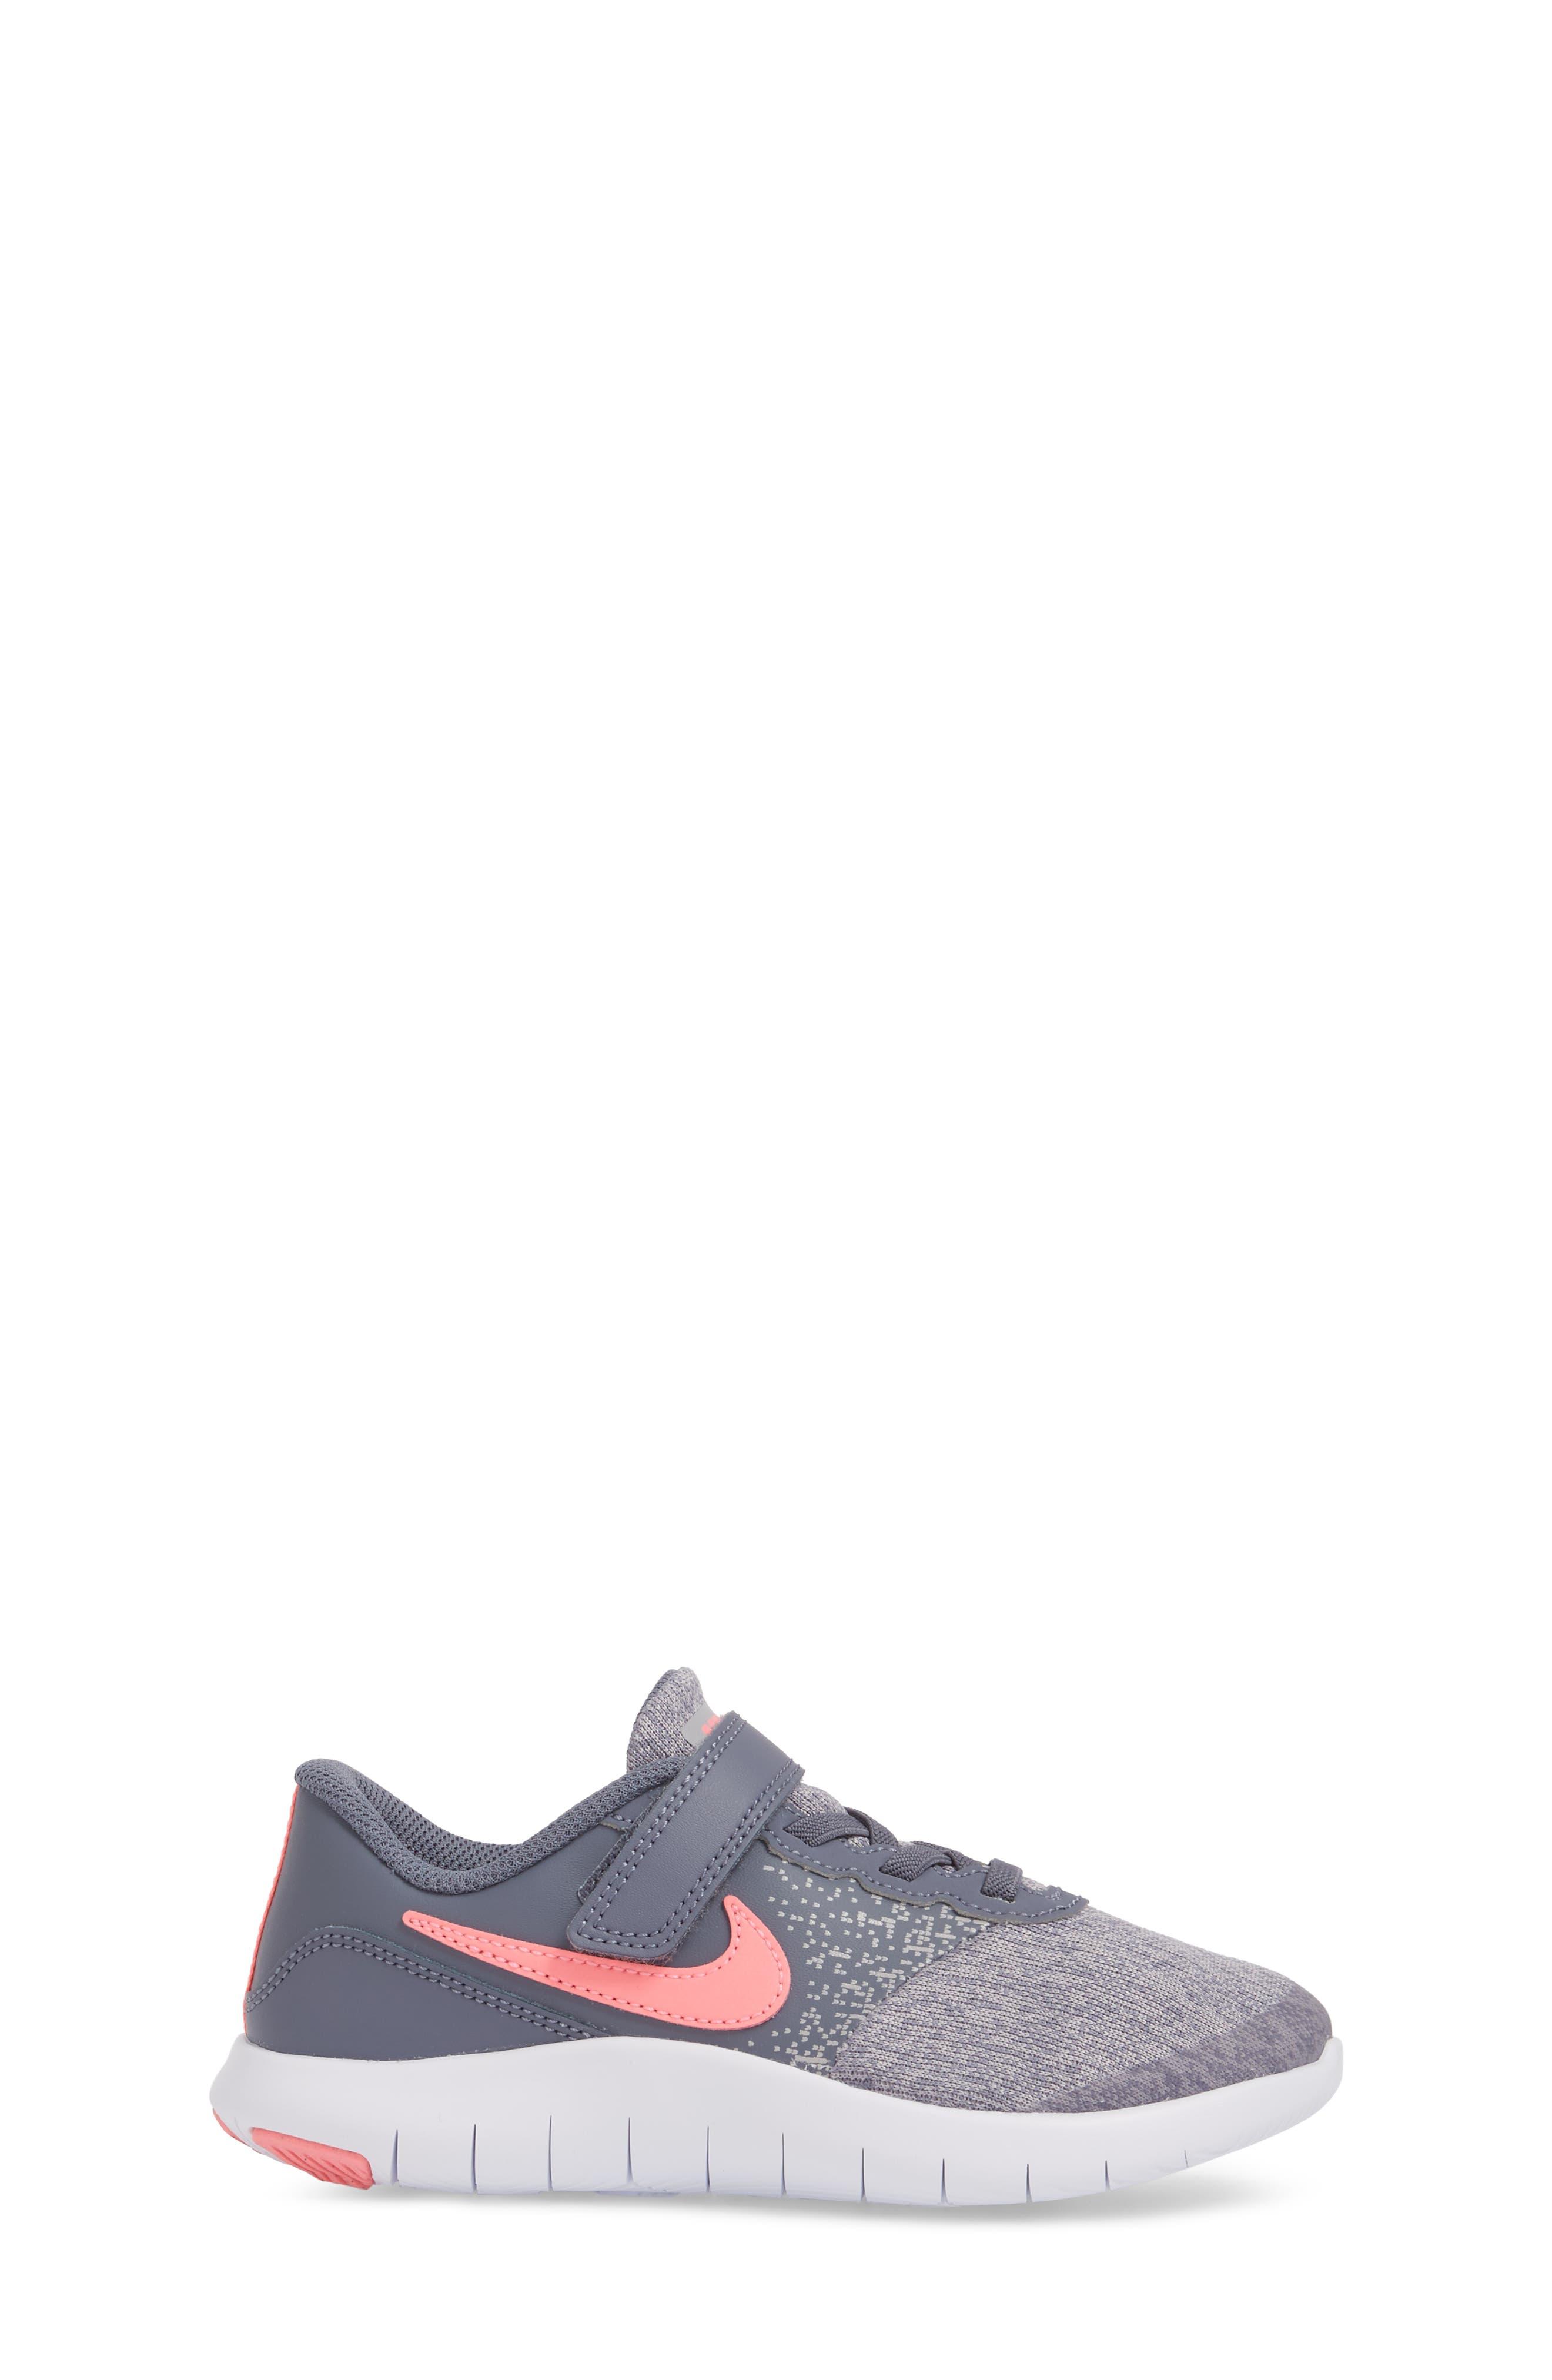 Flex Contact Running Shoe,                             Alternate thumbnail 3, color,                             LIGHT CARBON/ SUNSET PULSE